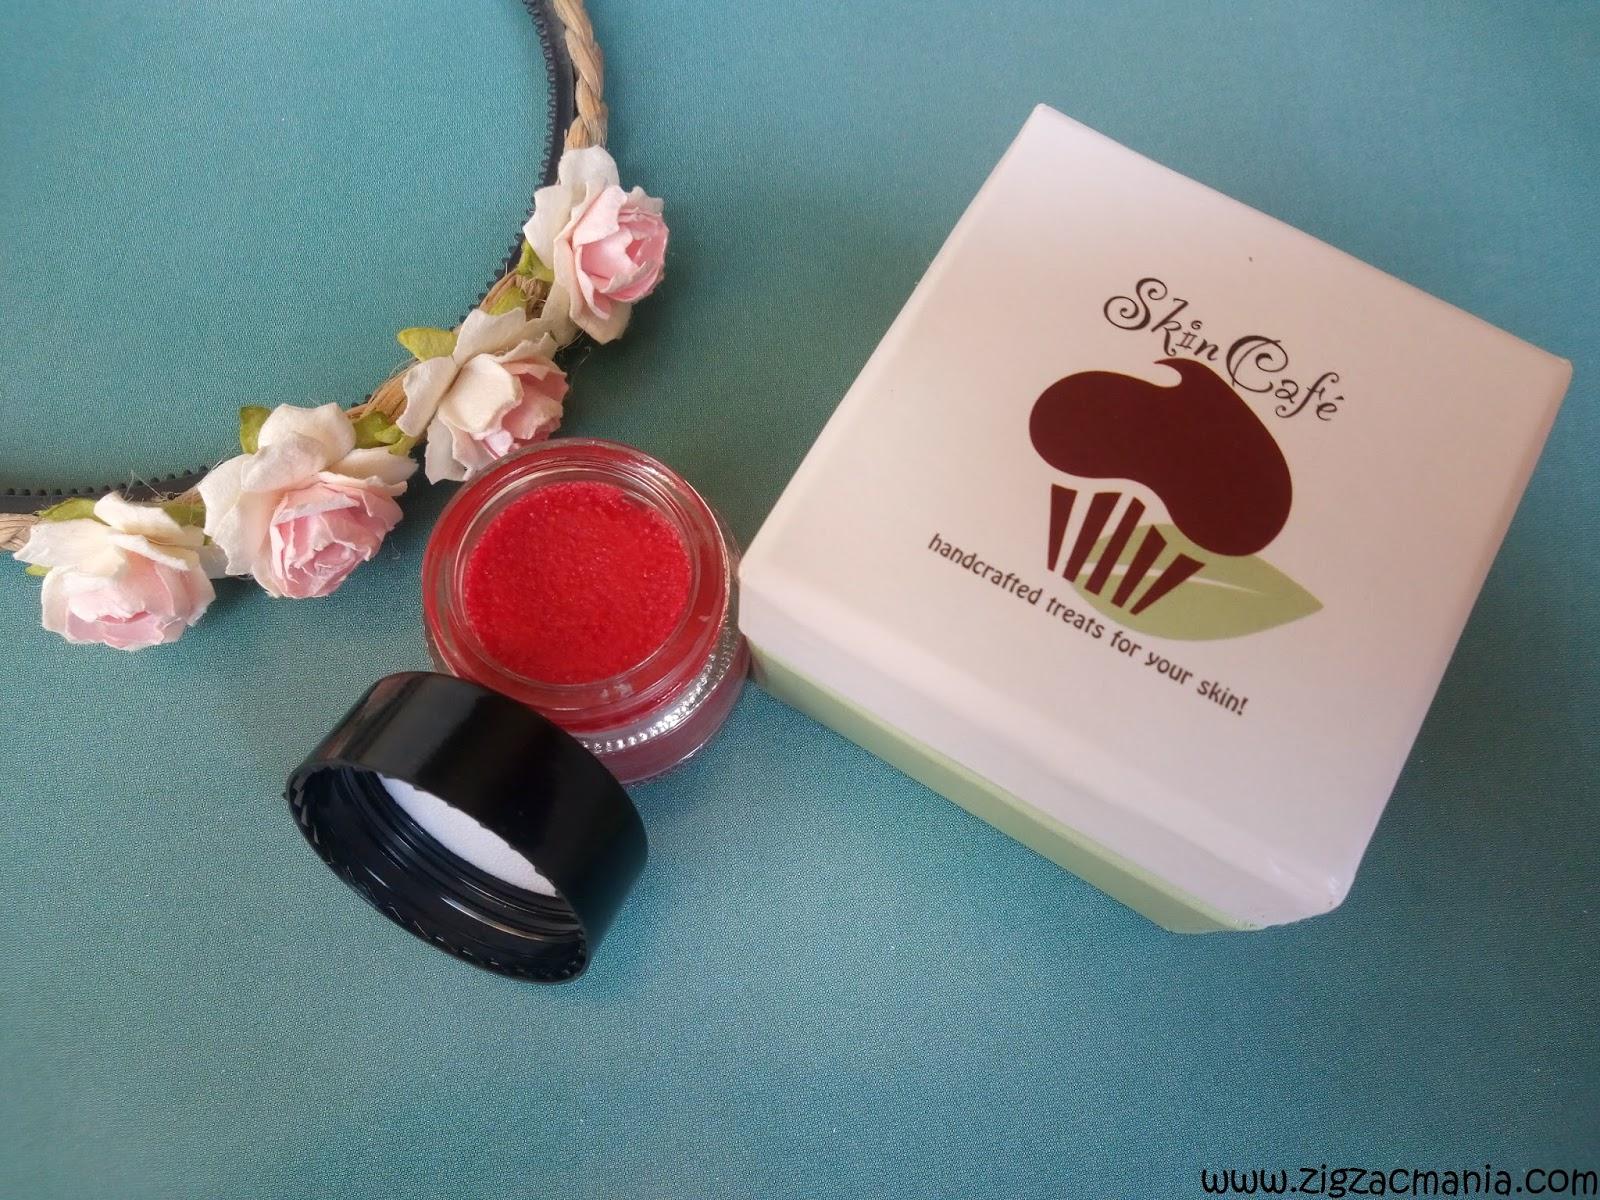 http://www.zigzacmania.com/2016/08/skin-cafe-red-velvet-cake-lip-tint-balm.html